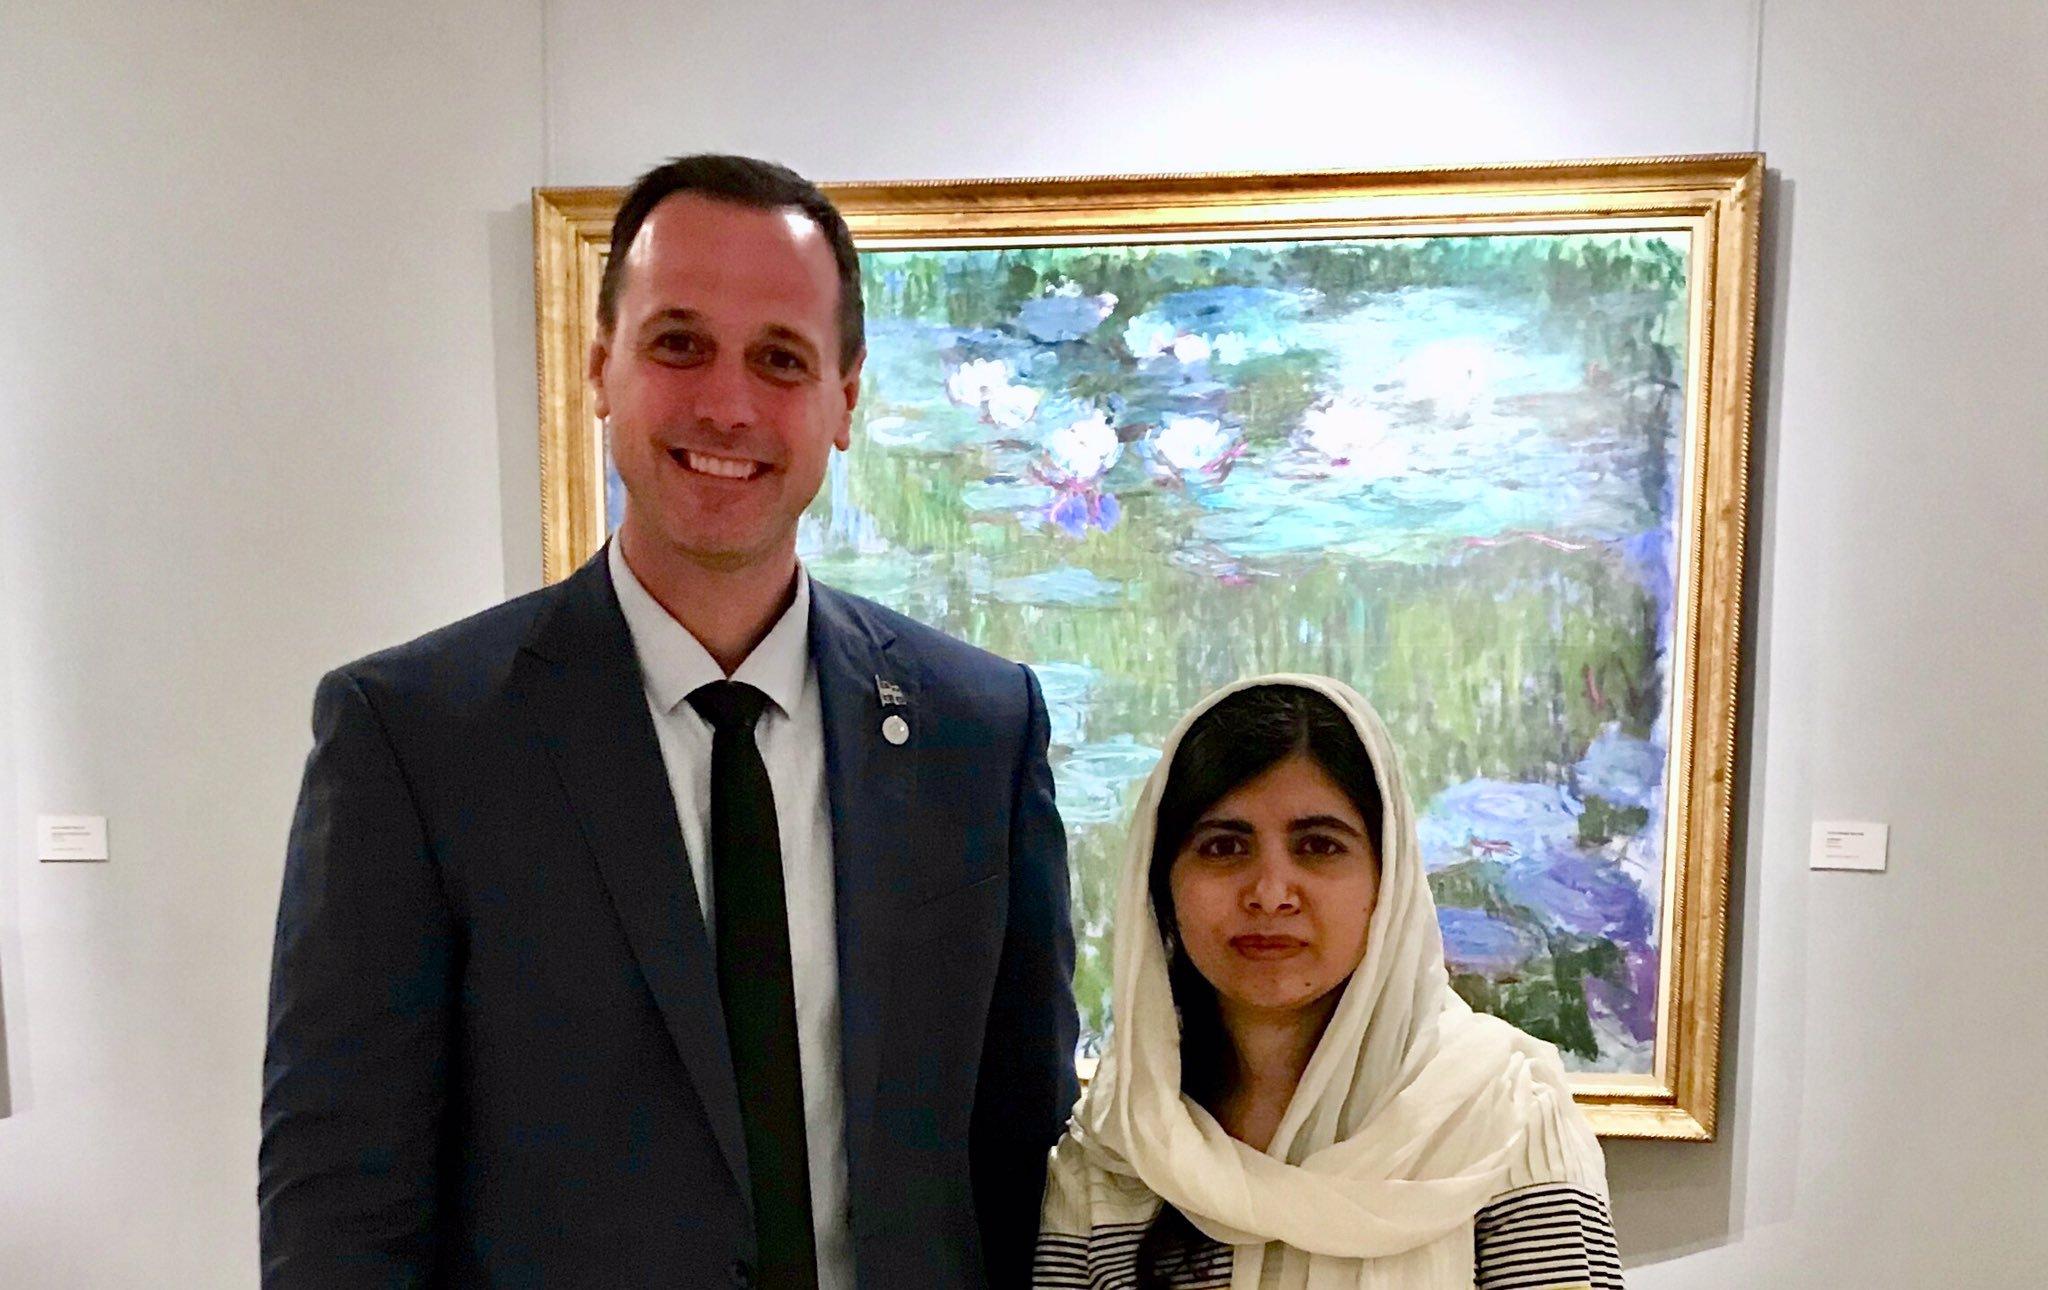 Quebec Education Minister Malala